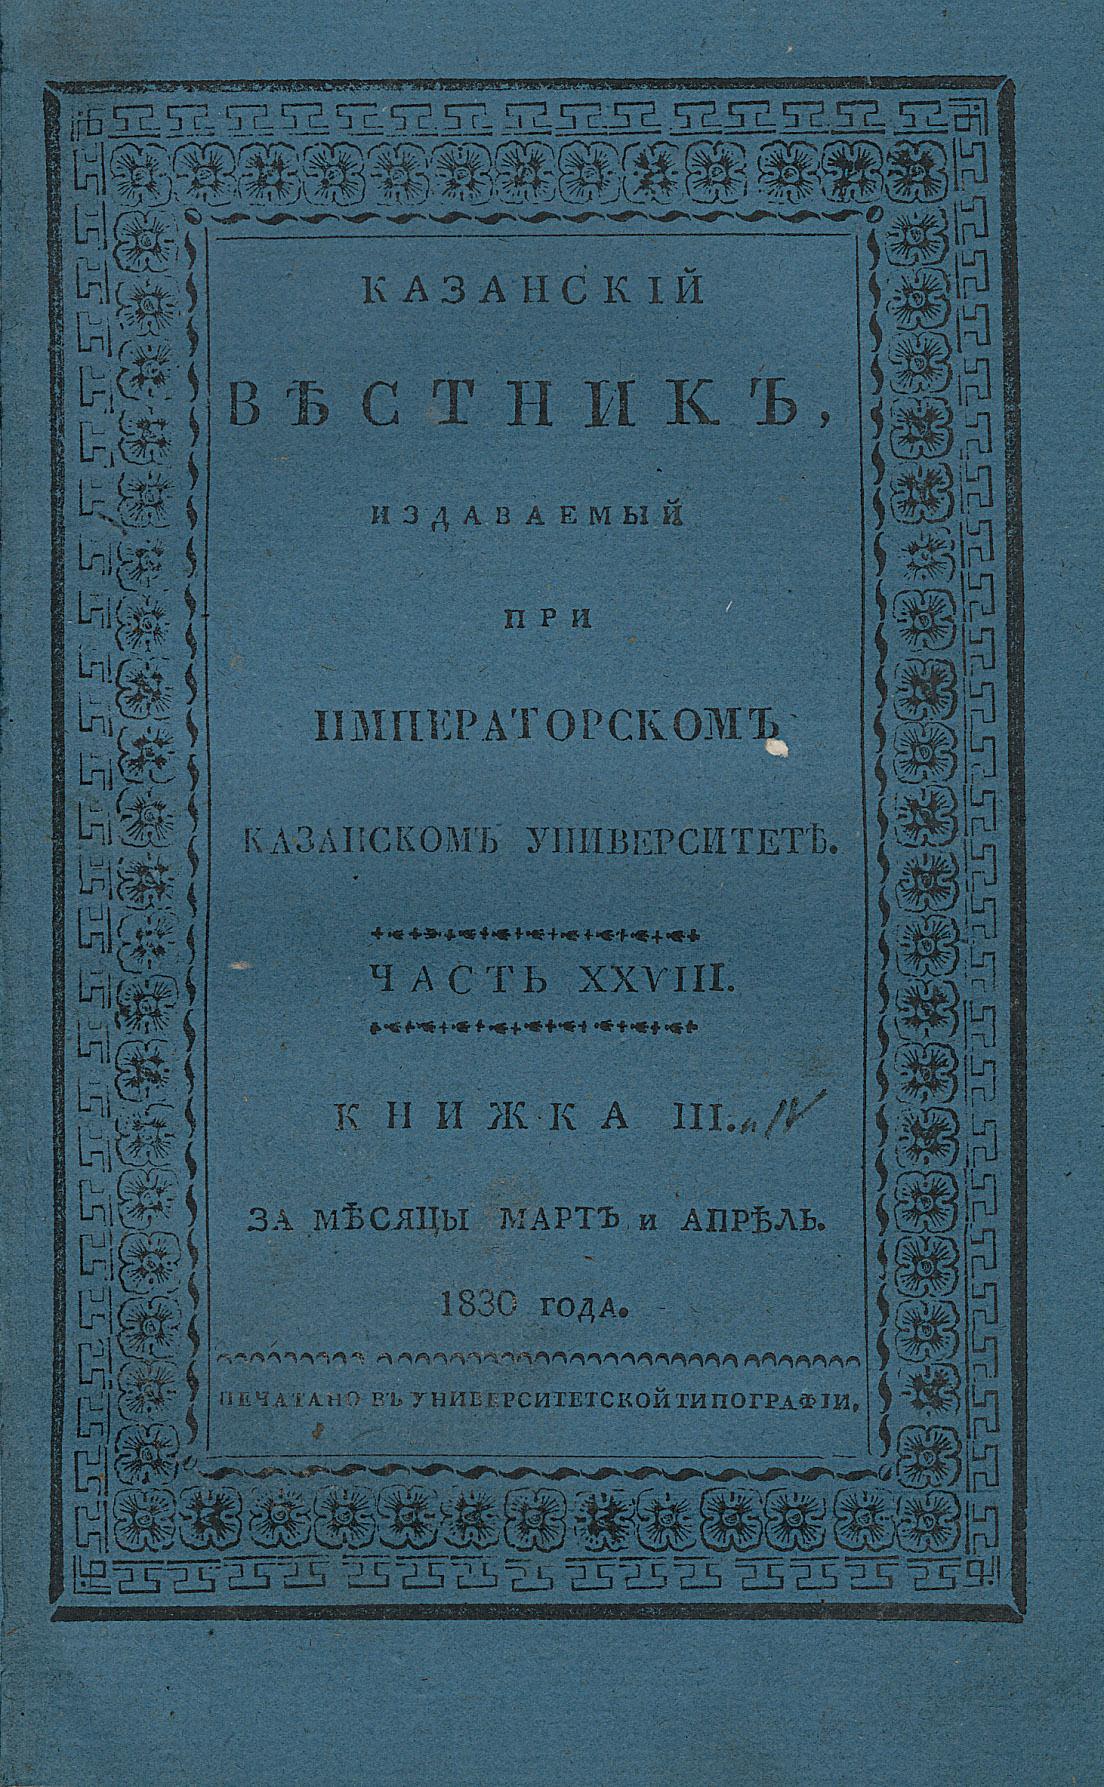 "LOBACHEVSKII, Nicolai Ivanovitch (1793-1856). ""O nachalakh geometrii"" [in Russian: ""On the Principles of Geometry""], in: Kazanskii vestnik, Part XXV (Feb. & Mar. 1829 pp. 178-187), Part XXV (April 1829 pp. 228-241), Part XXVII (Nov. & Dec. 1829 pp. 227-243); Part XXVIII (Mar. & Apr. 1830 pp. 251-283); Part XXVIII (July & Aug. 1830 pp. 571-636). Kazan: University Press, 1829-30."